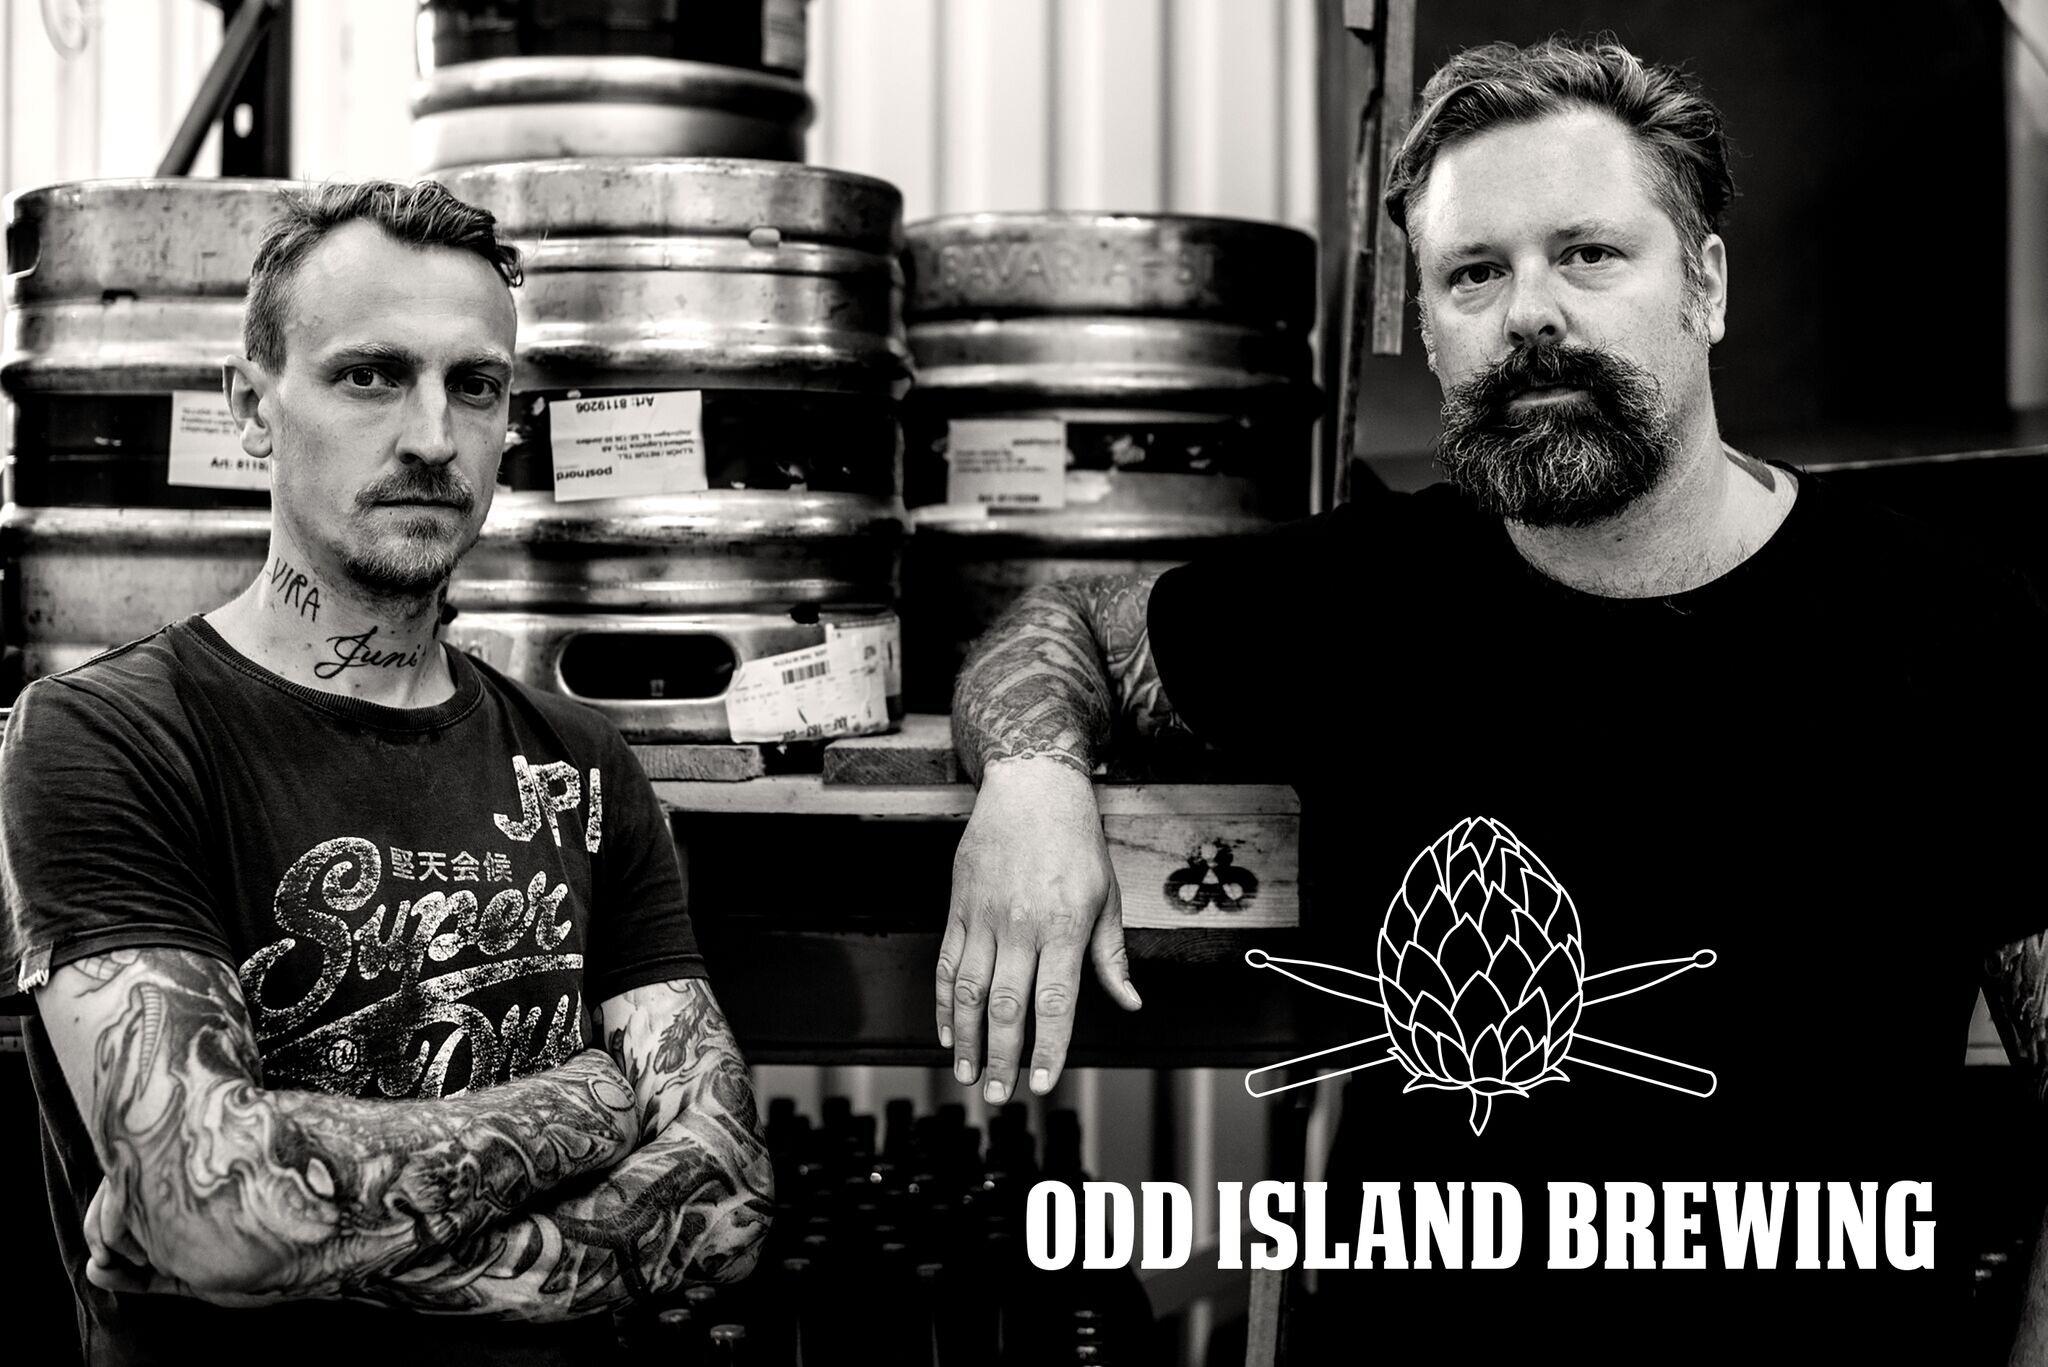 odd island